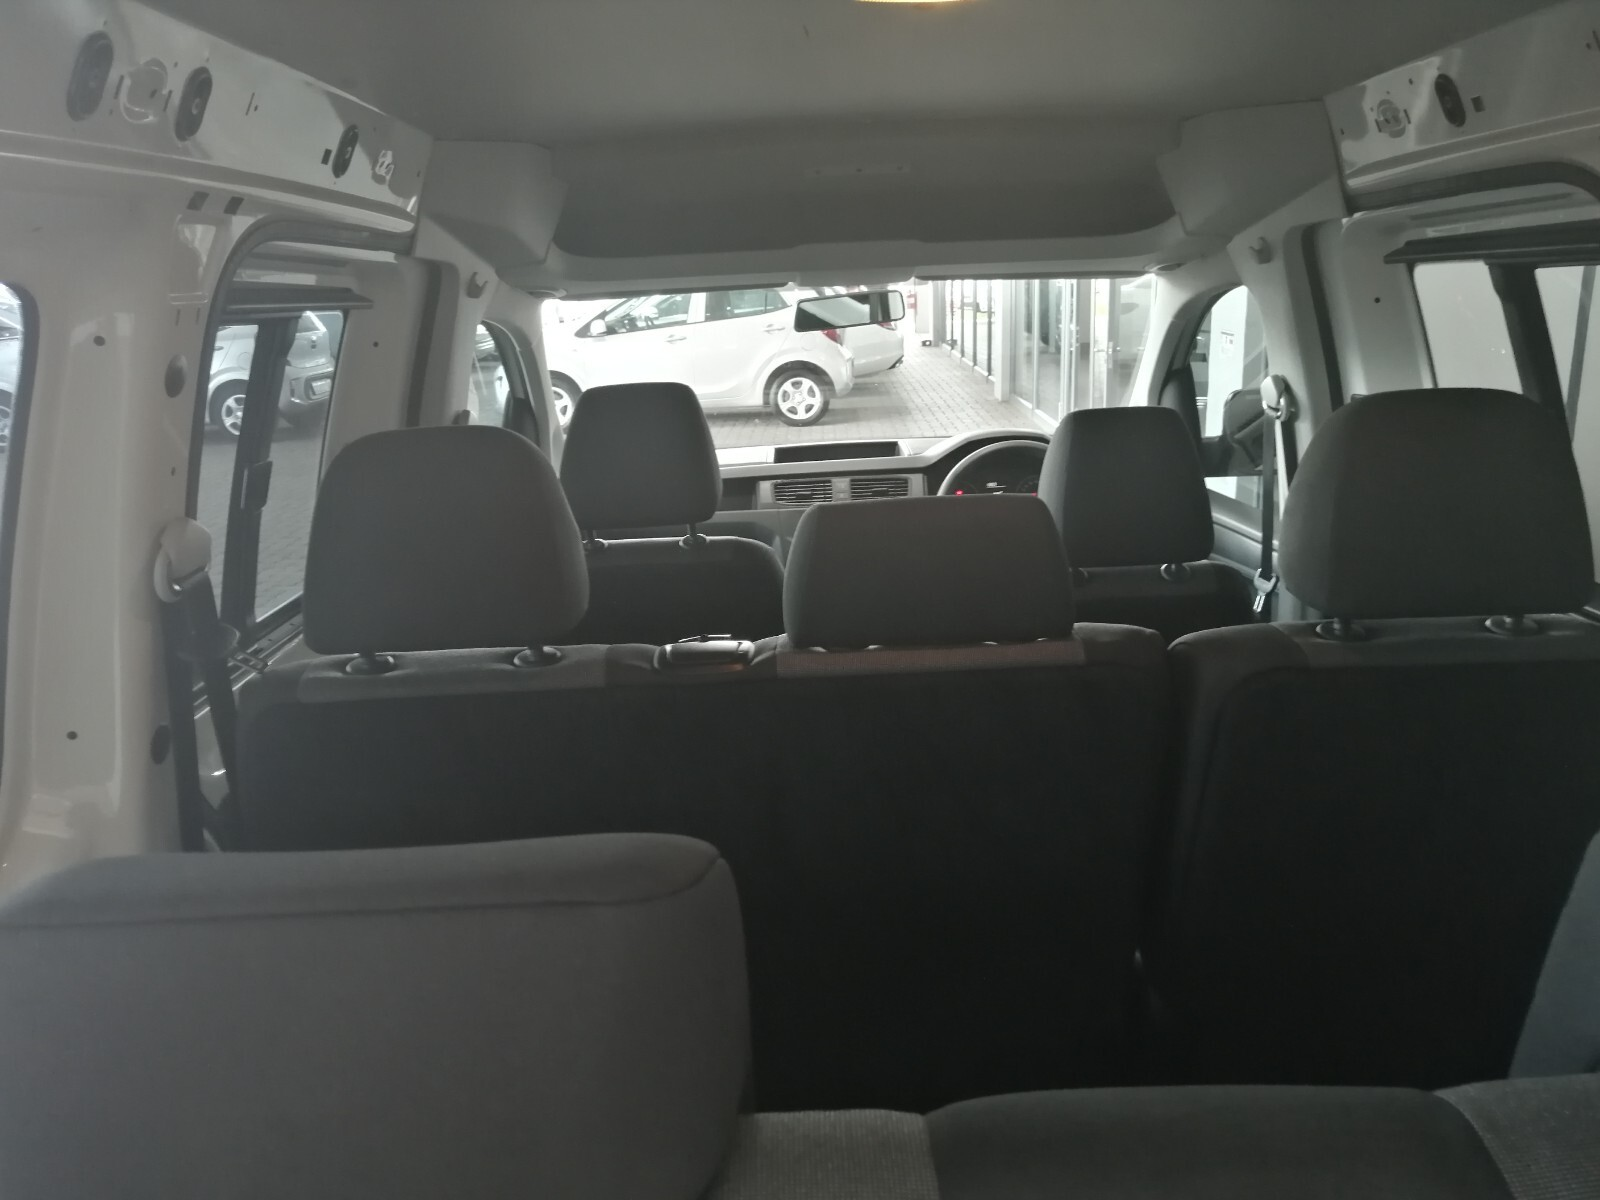 VOLKSWAGEN CREWBUS 1.6i  (7 SEAT) Benoni 14326169